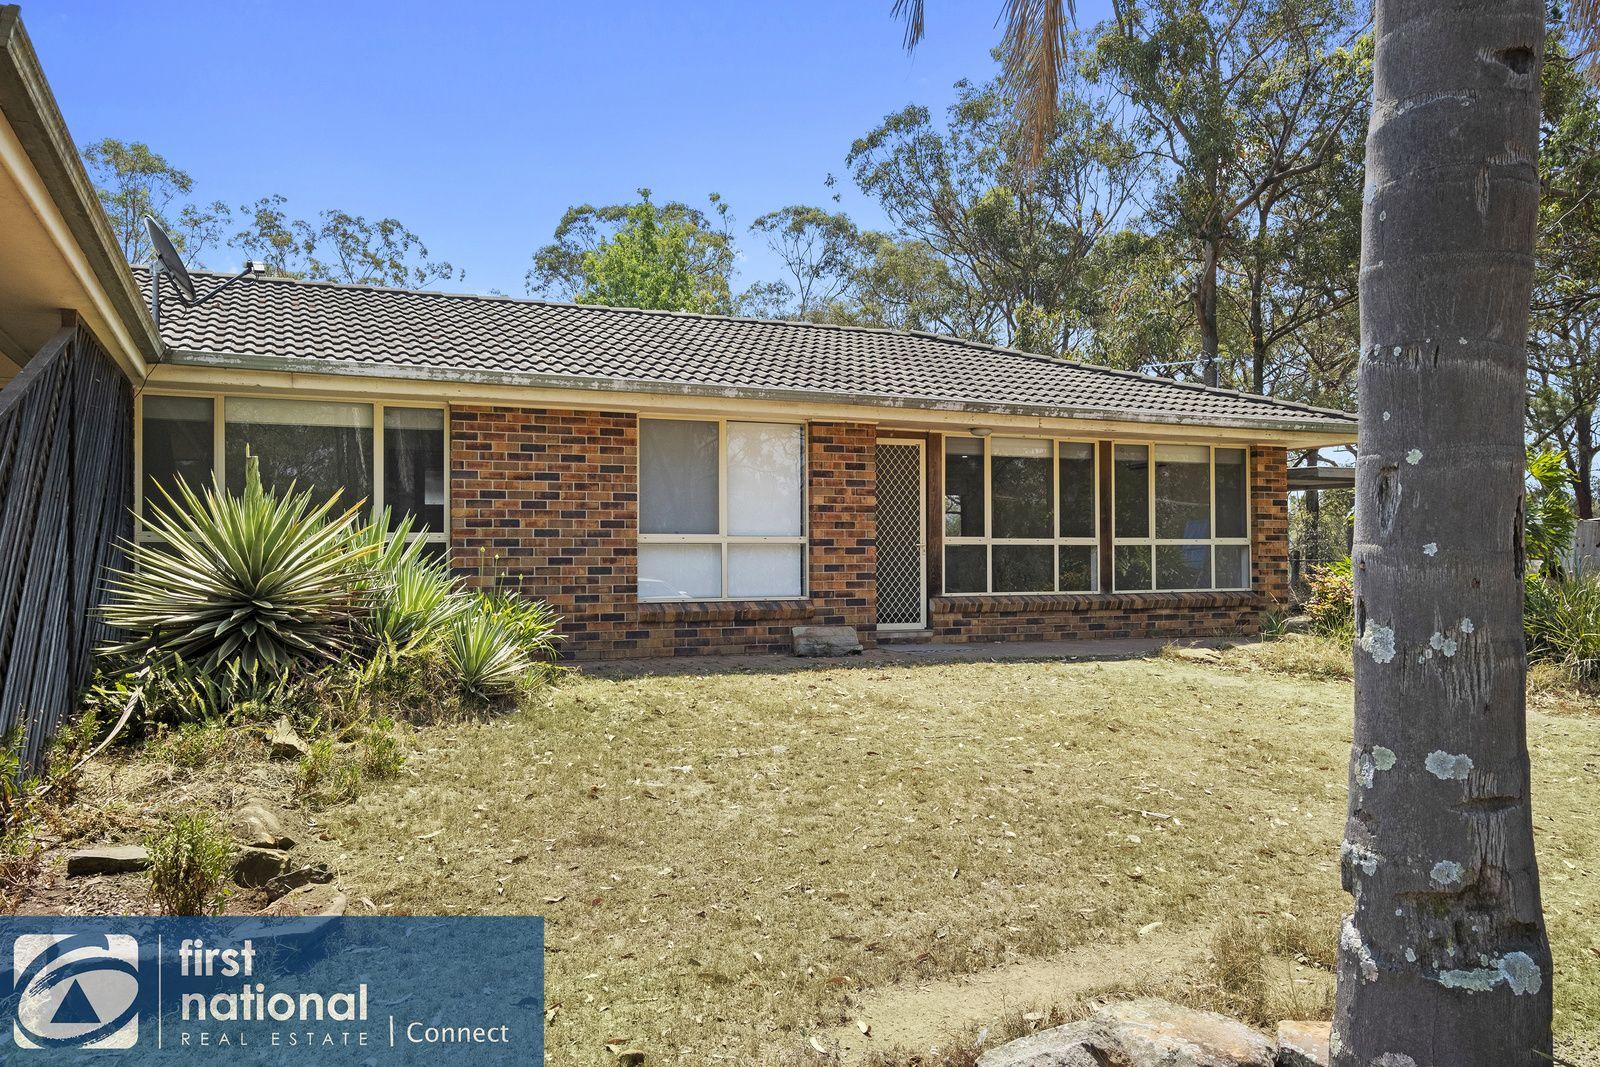 2/387 Tennyson Road, Tennyson NSW 2754, Image 0